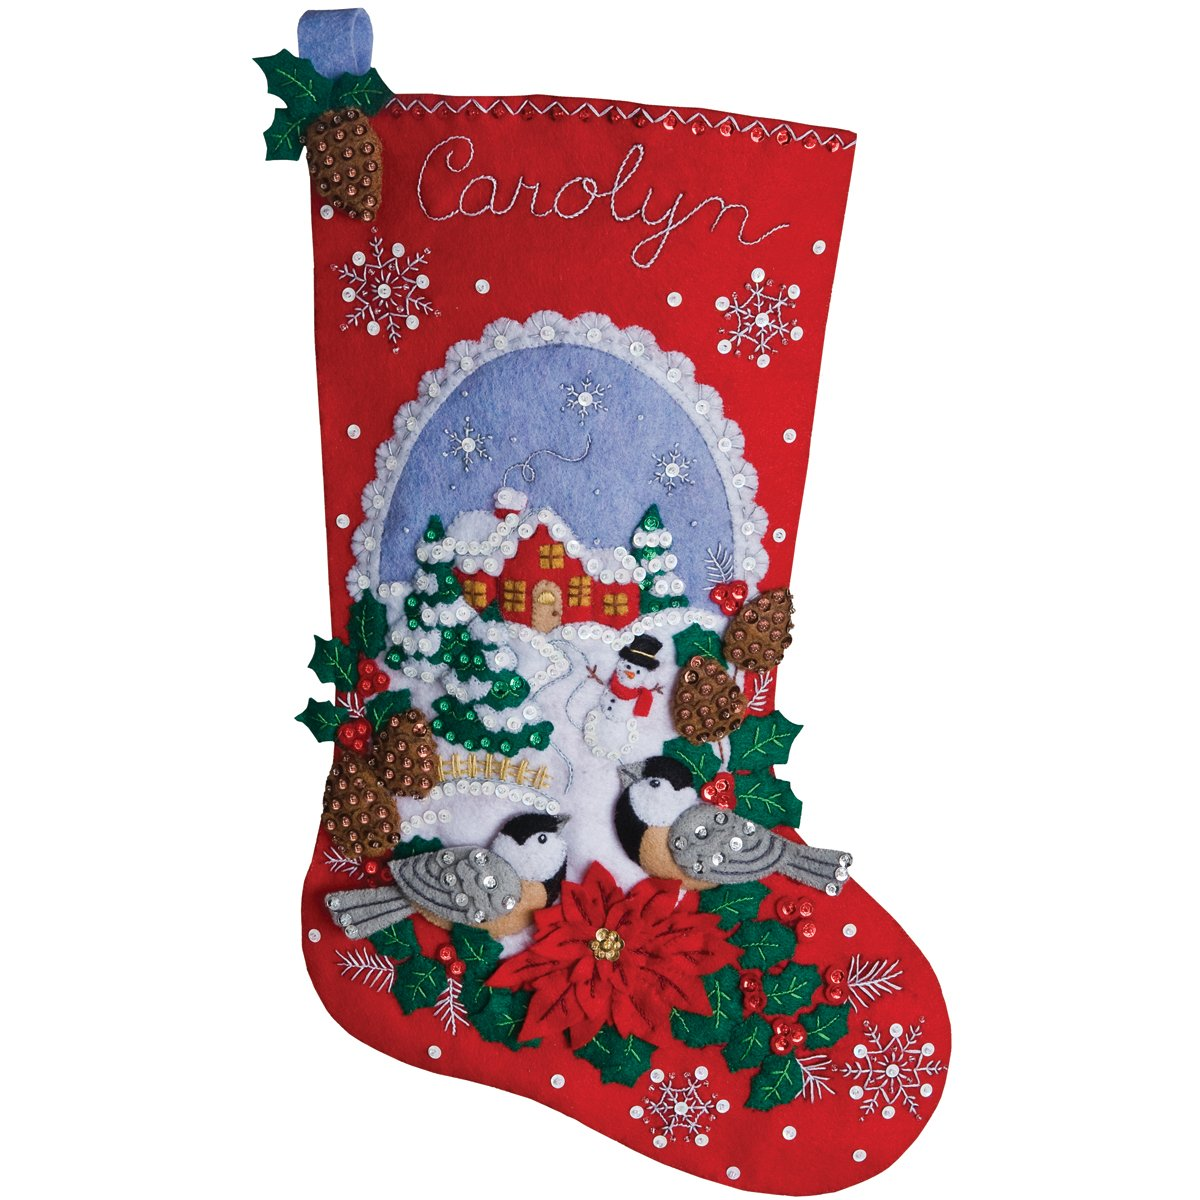 Bucilla 18-Inch Christmas Stocking Felt Applique Kit, 86326 Chickadees Plaid Inc